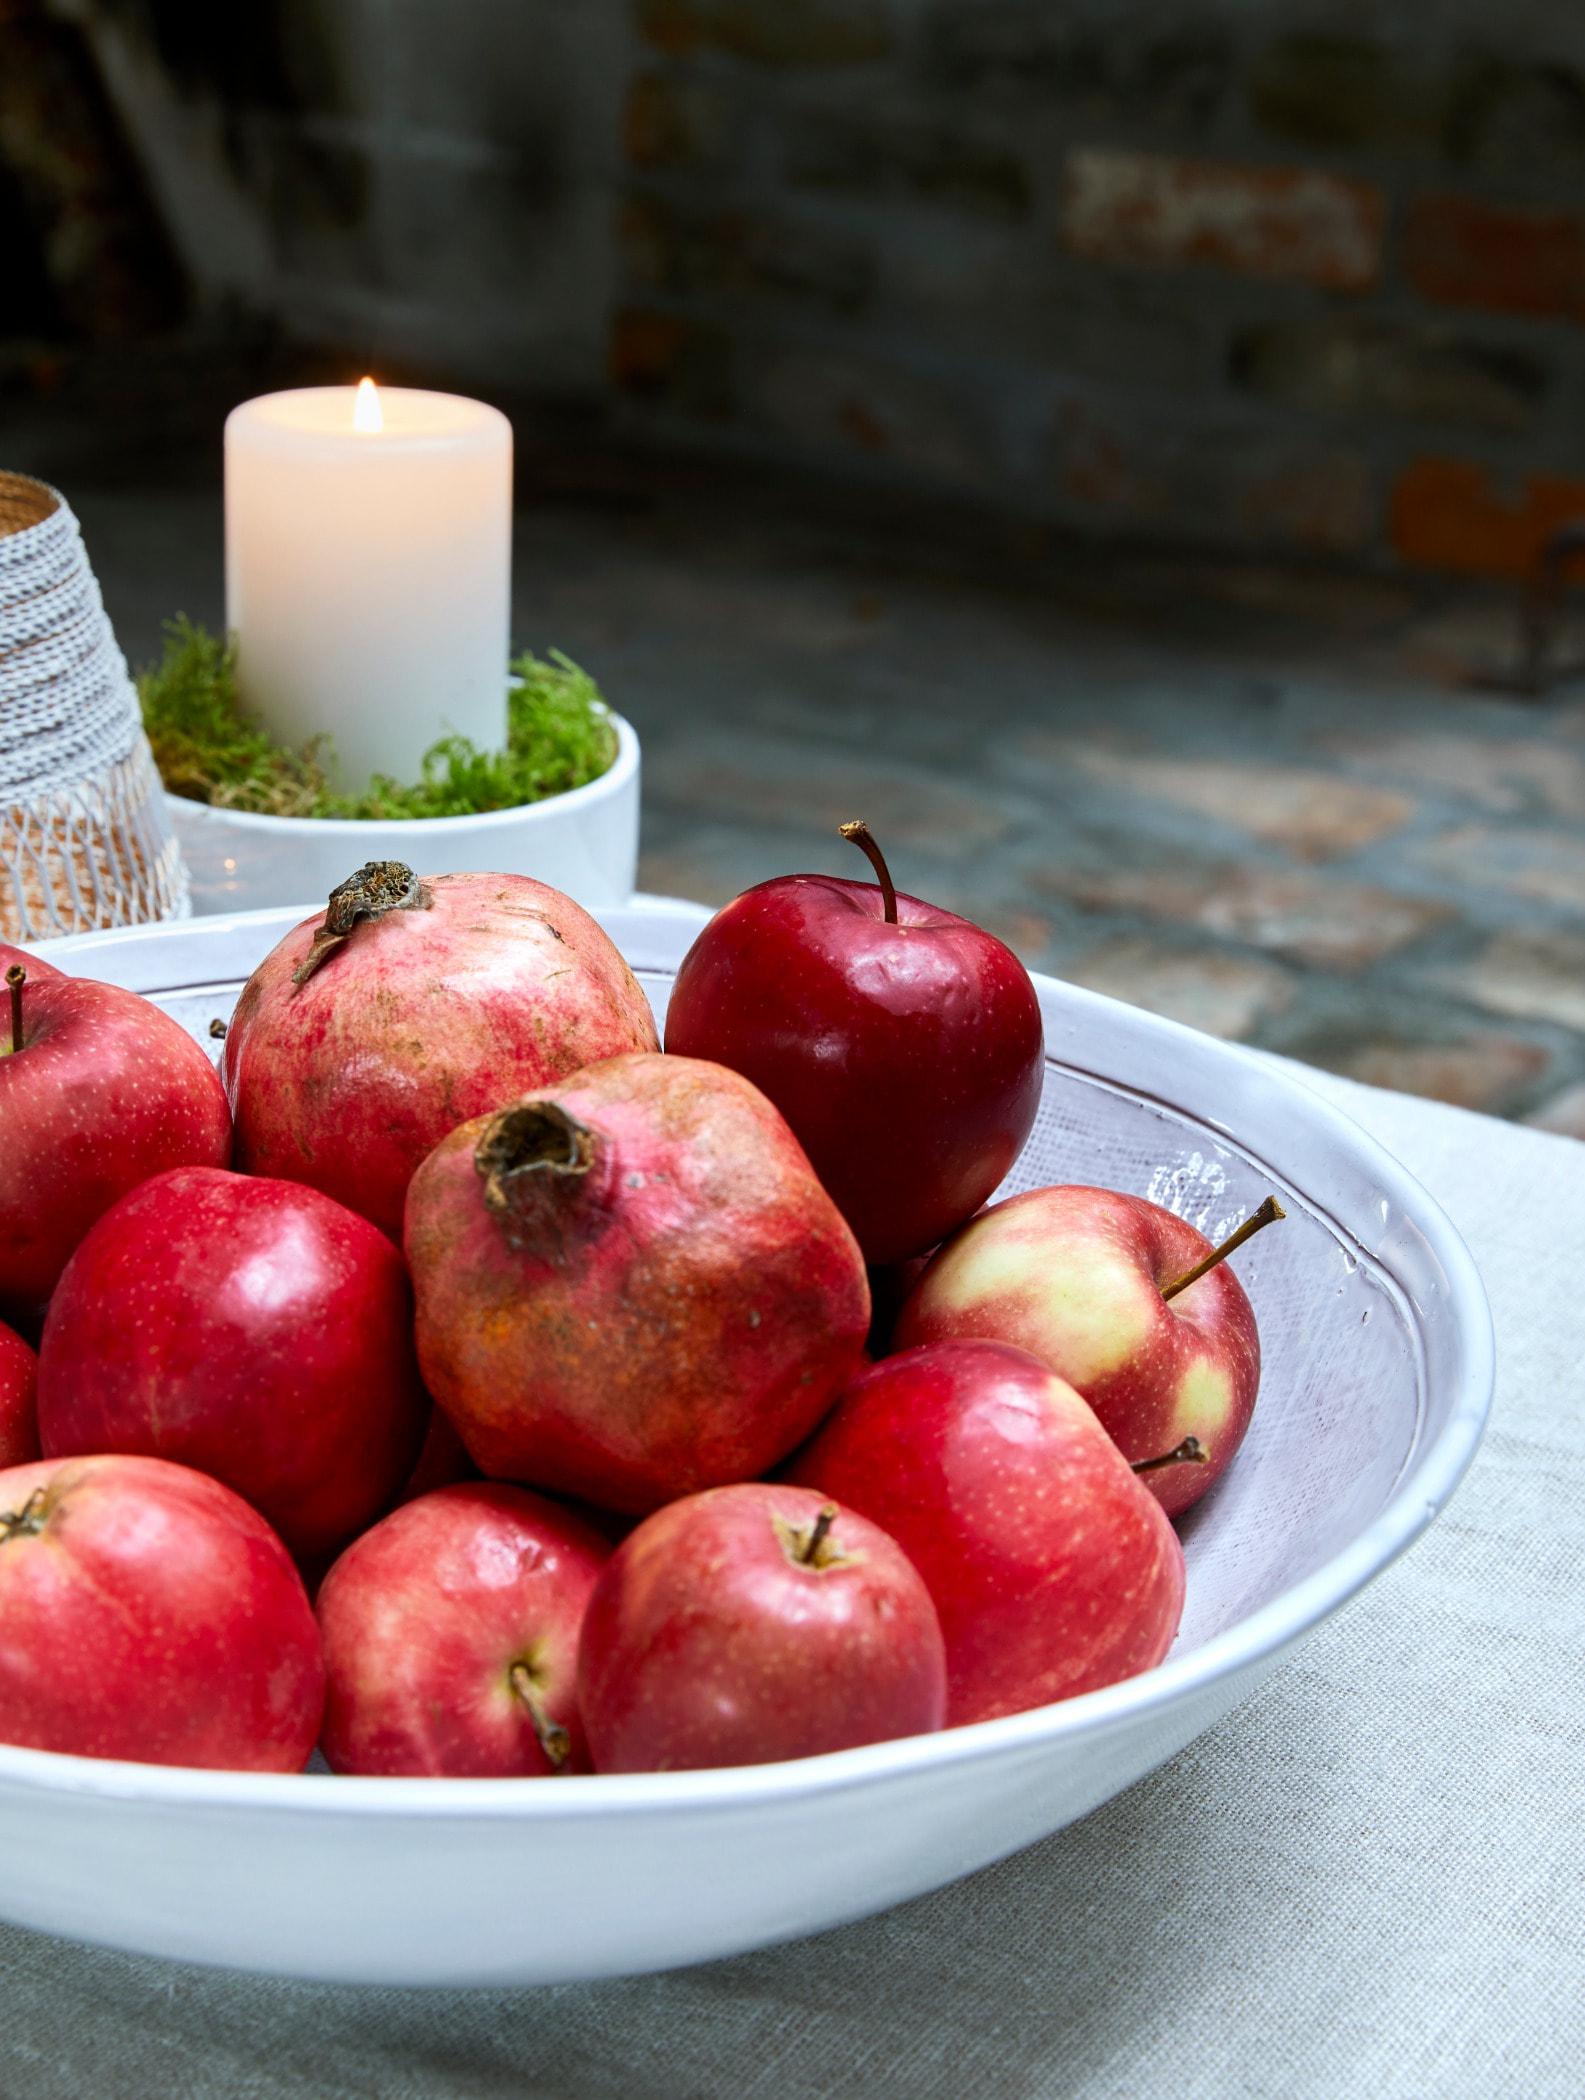 Local food, Natural foods, Superfood, Plant, Fruit, Apple